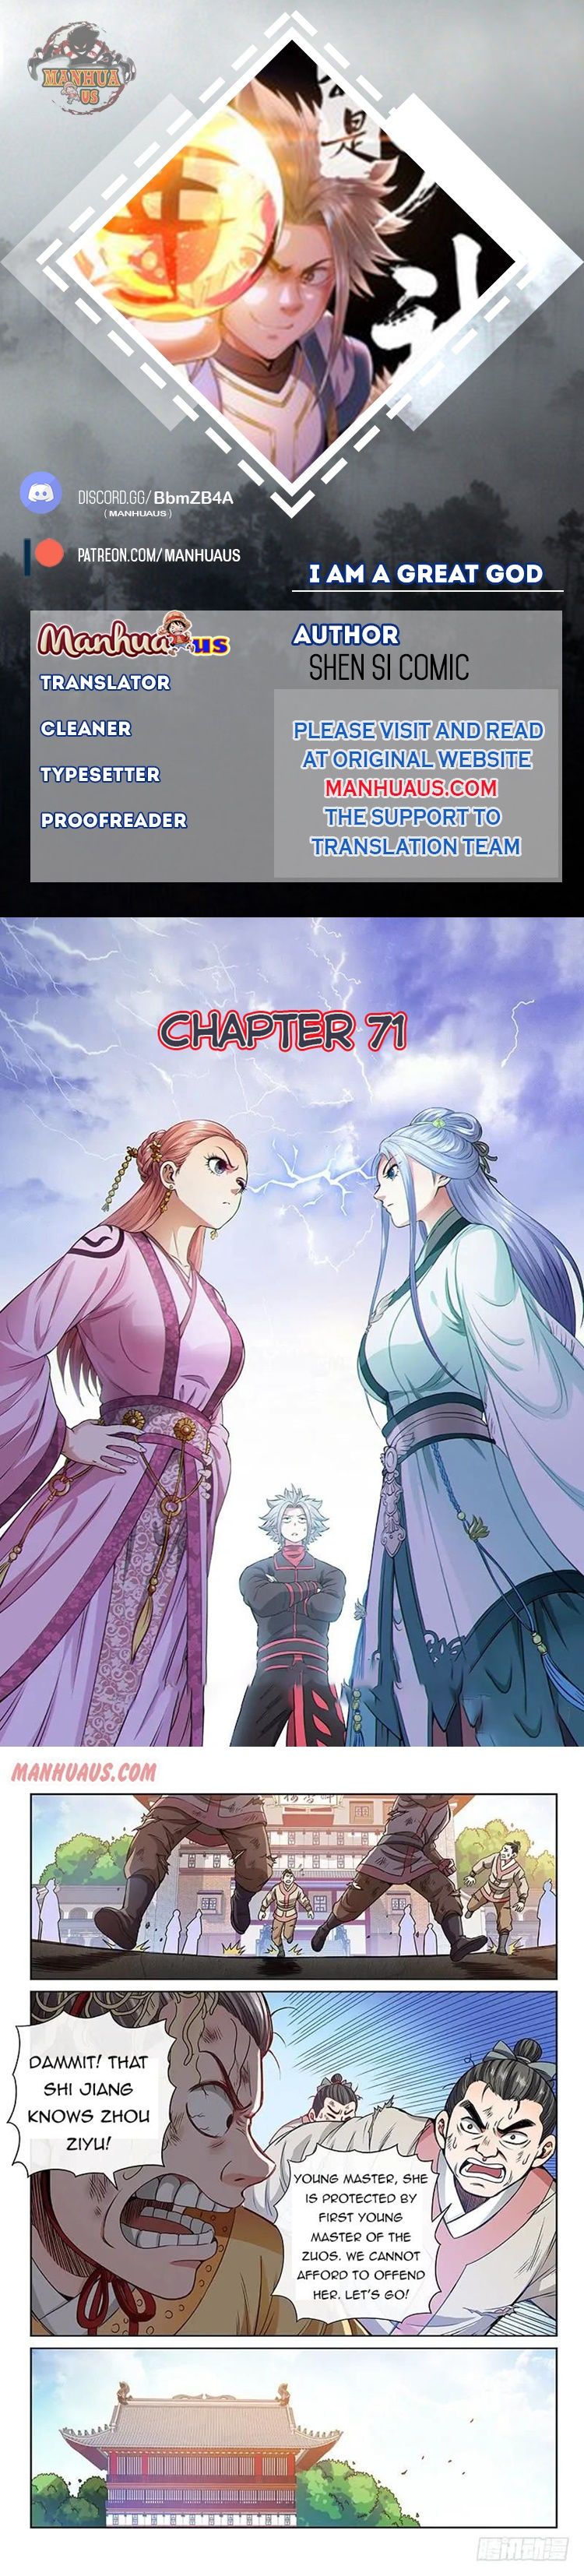 https://manga.mangadogs.com/comics/pic4/4/21124/2823102/c348616cd8a86ee661c7c98800678fad.jpg Page 1